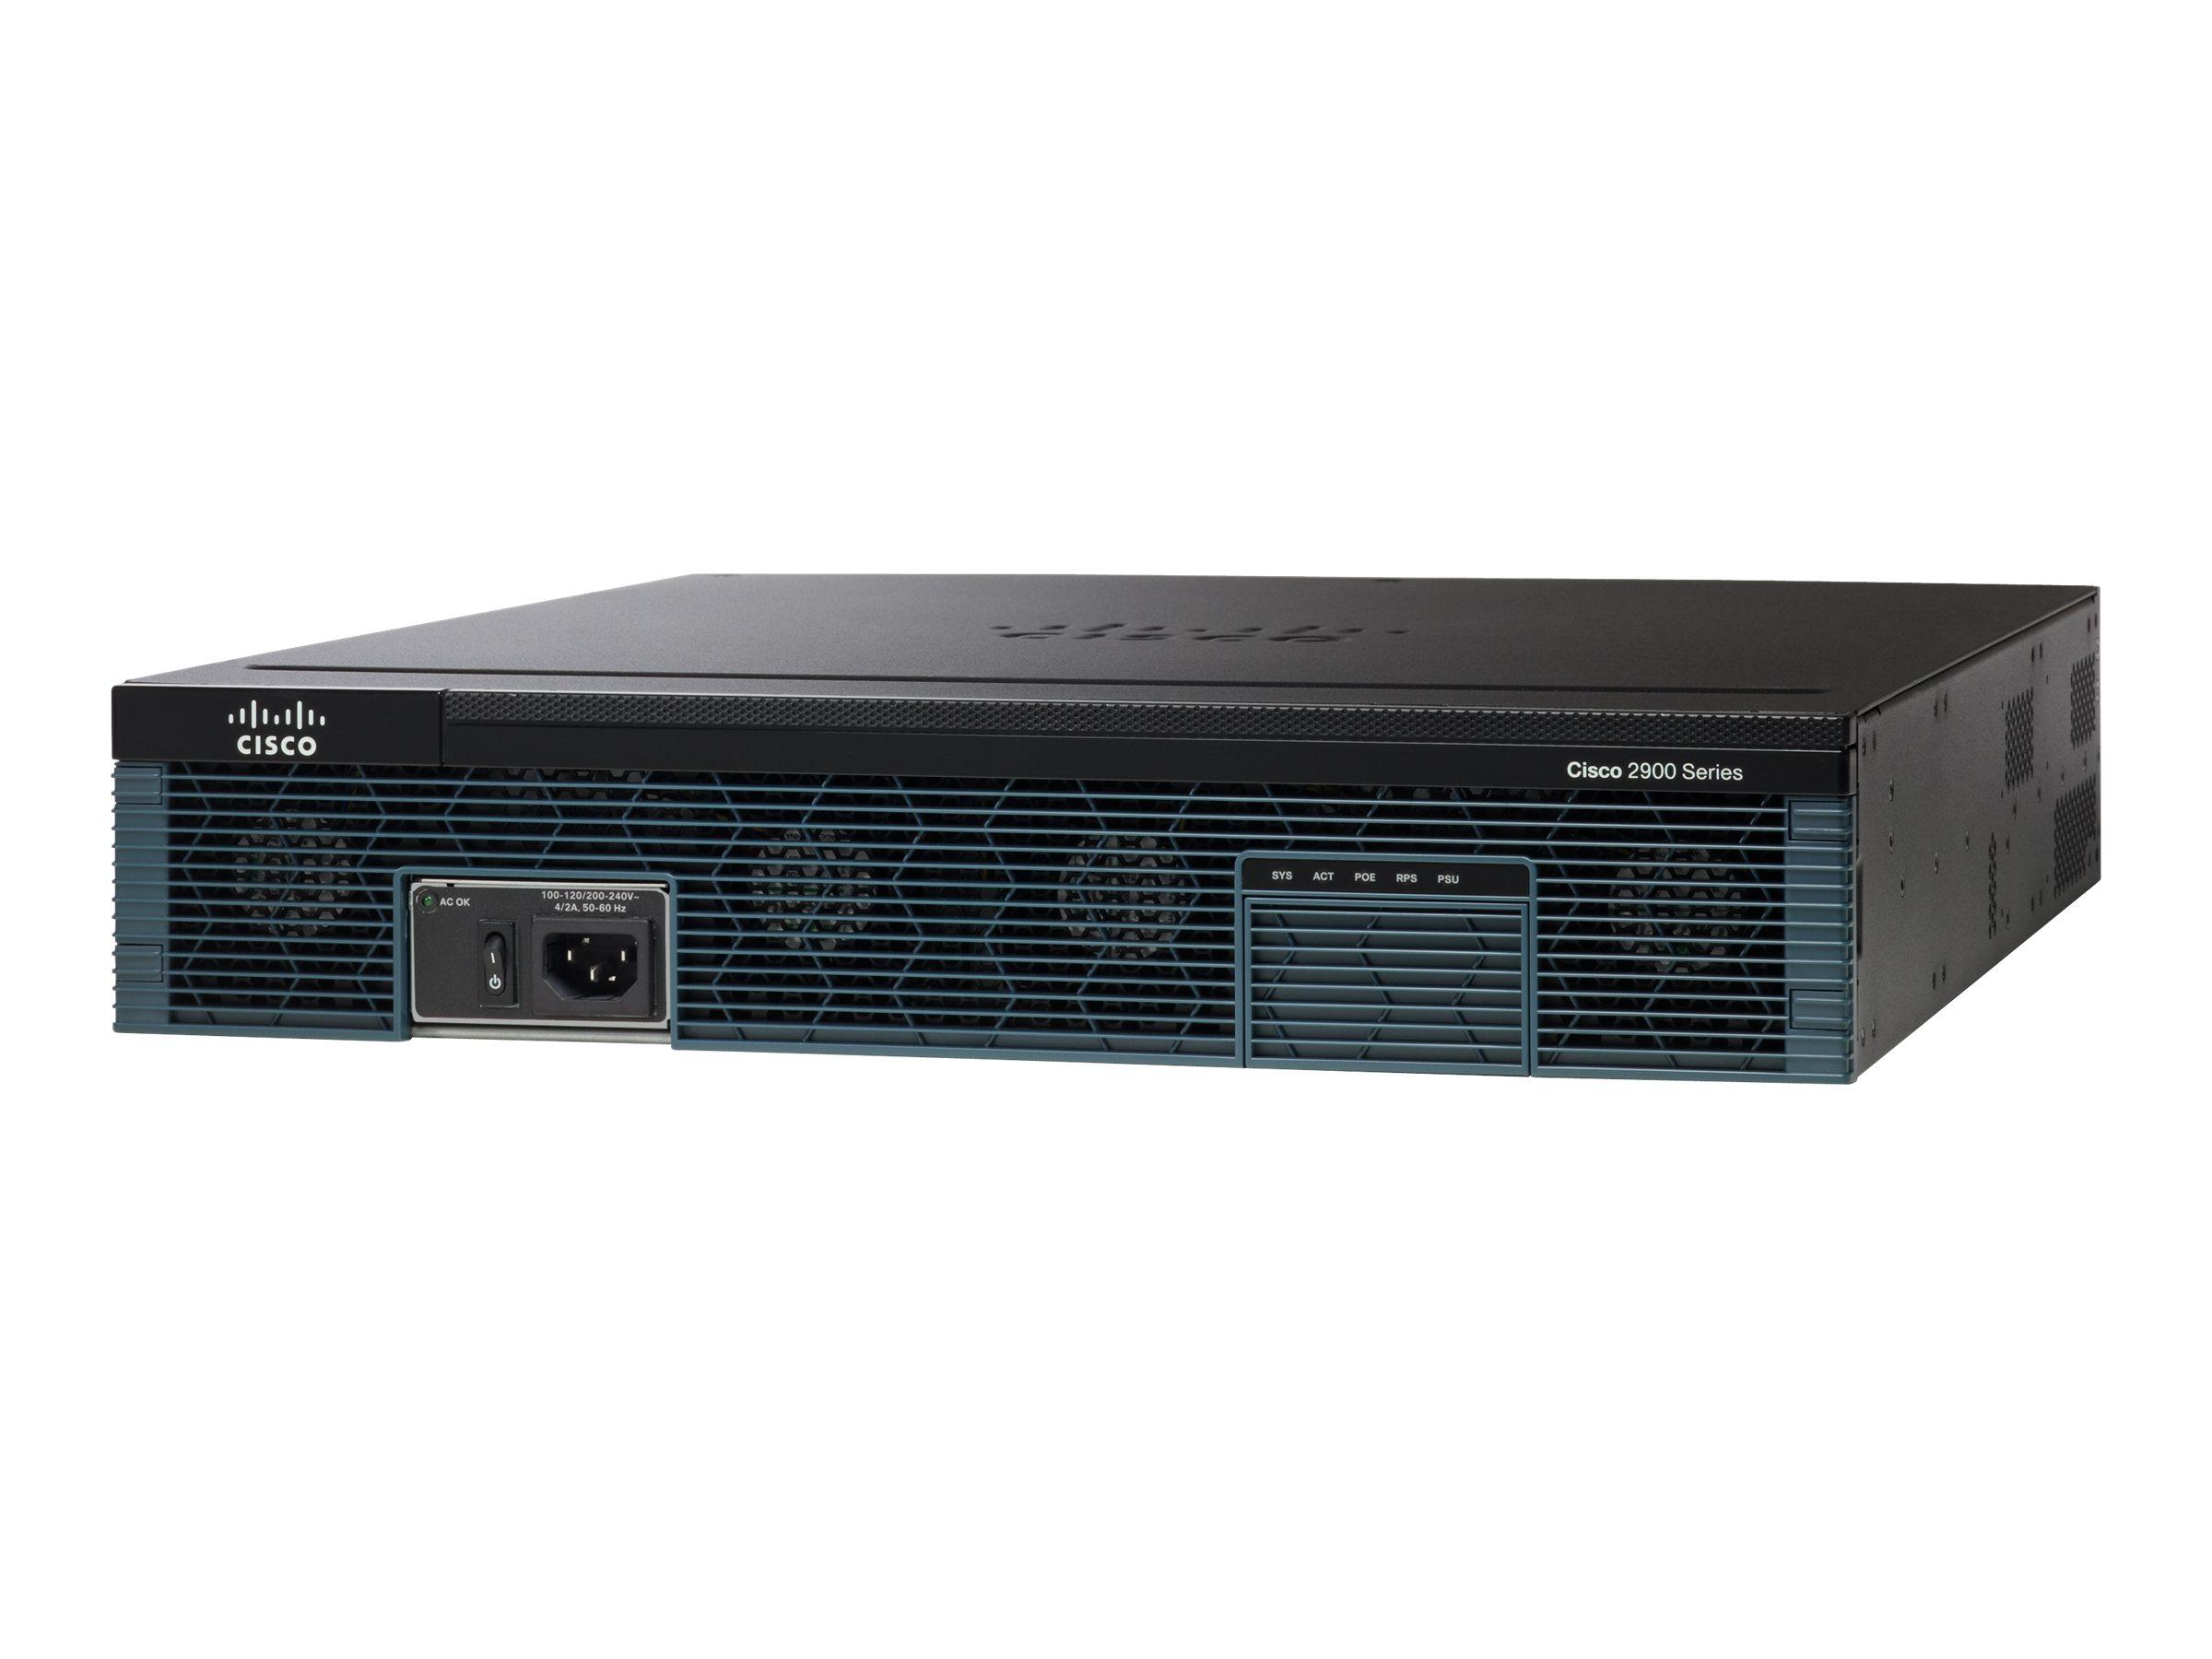 Cisco 2921 Router(CISCO2921/K9) - REFURB